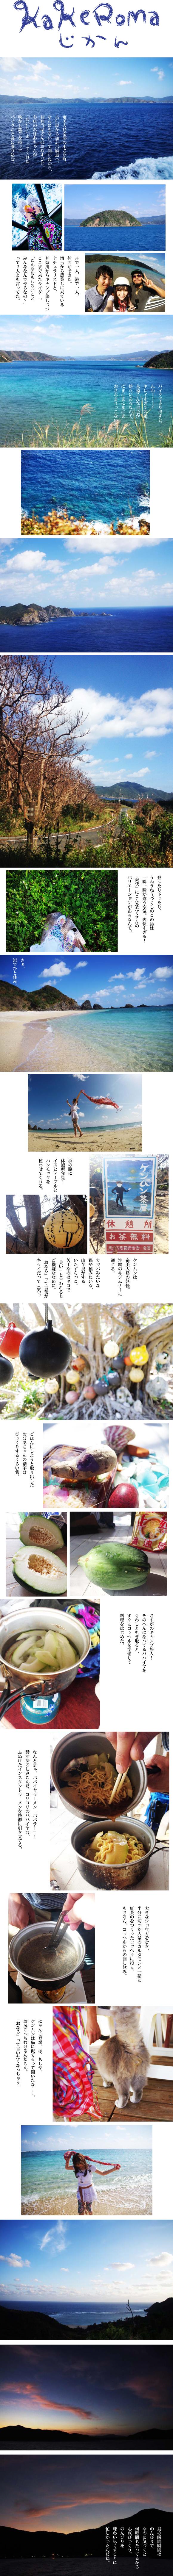 tomako178.jpg